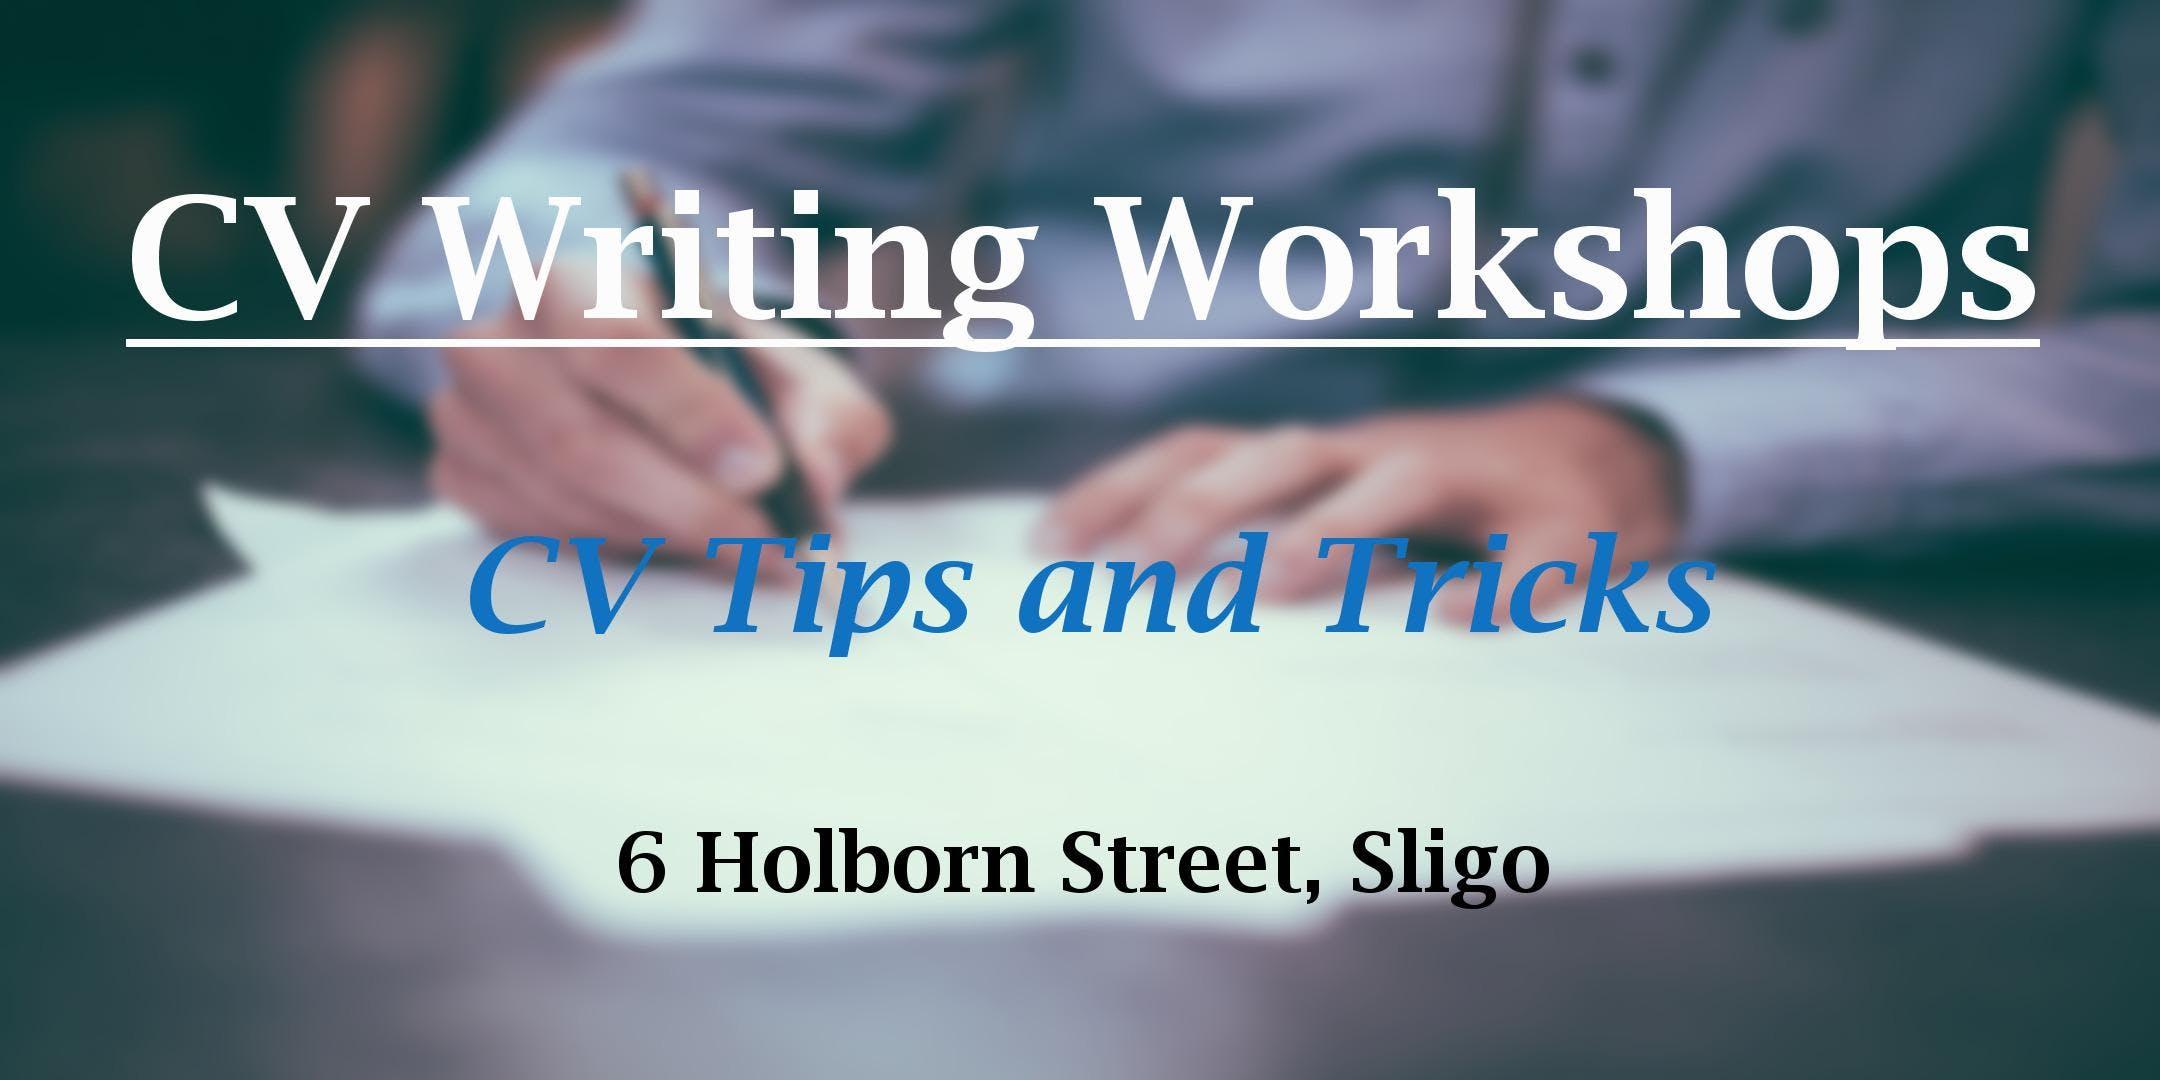 CV Writing Workshop